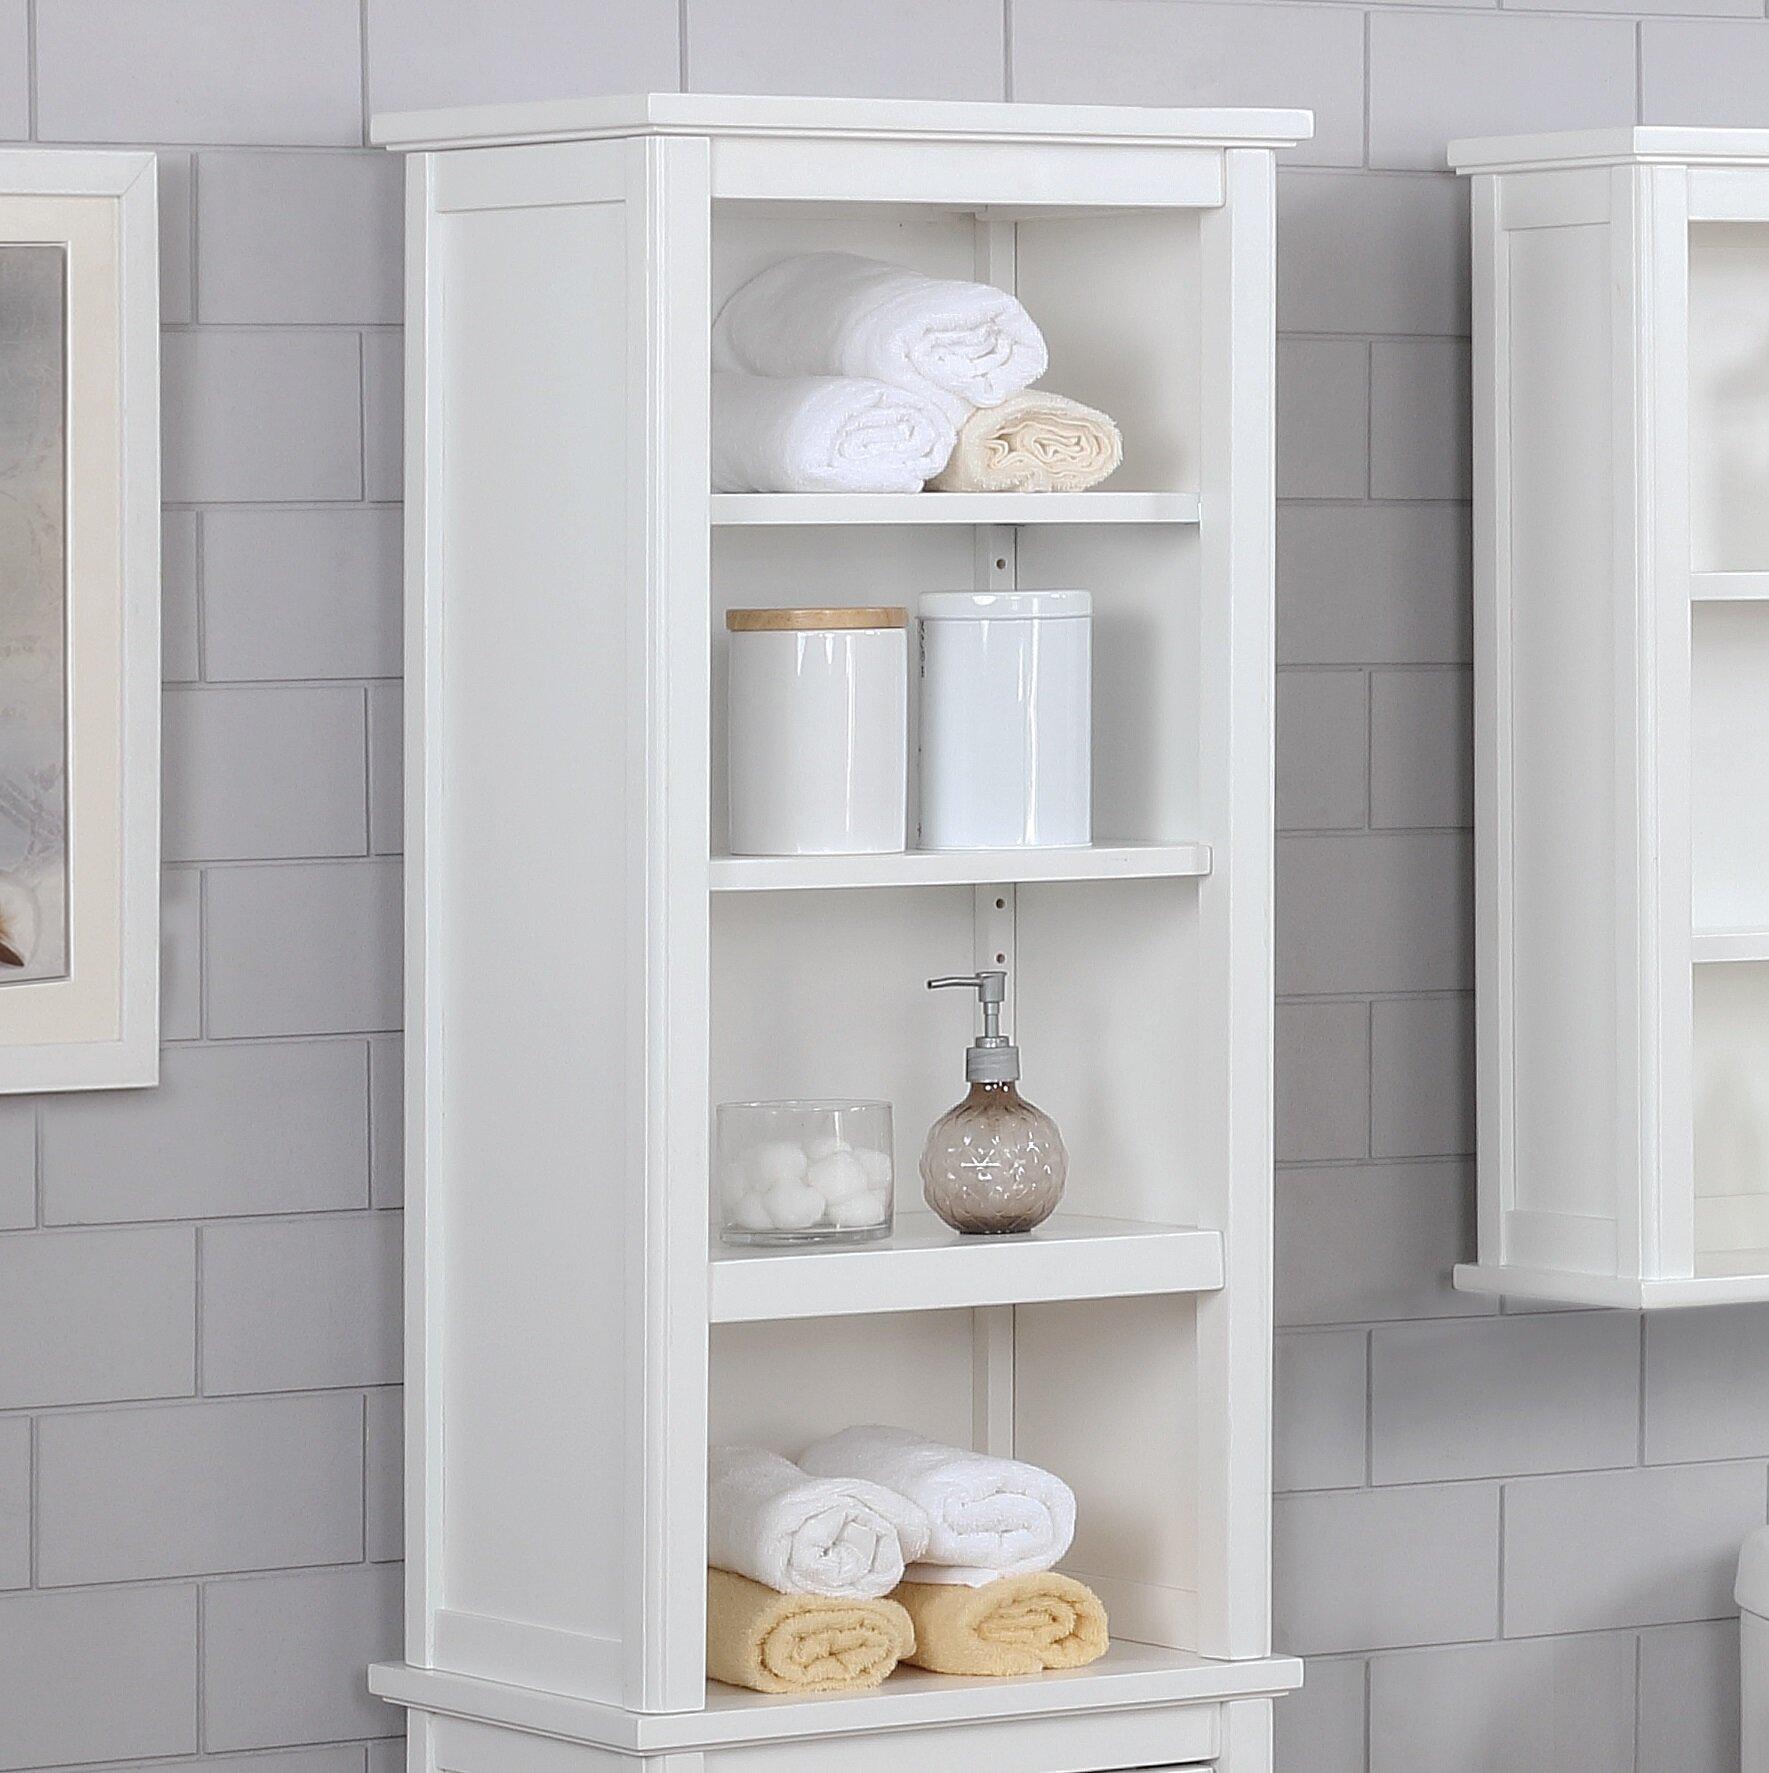 Highland Dunes Carruthers 17 W X 36 H X 13 D Free Standing Bathroom Shelves Reviews Wayfair